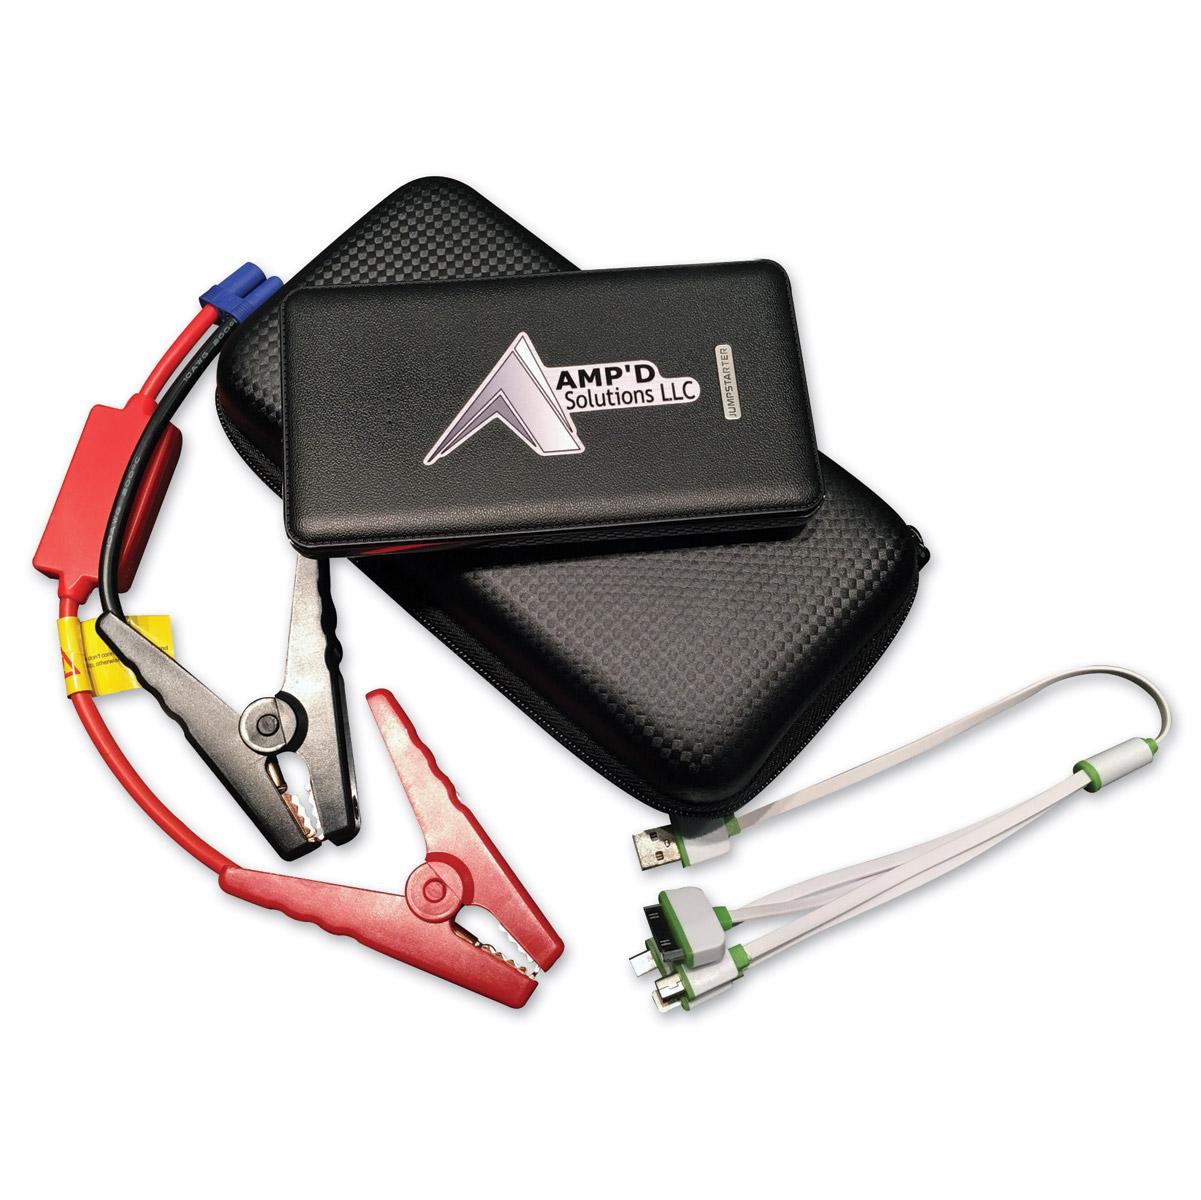 Amp'd Solutions Black Ultra-Slim Jump Starter